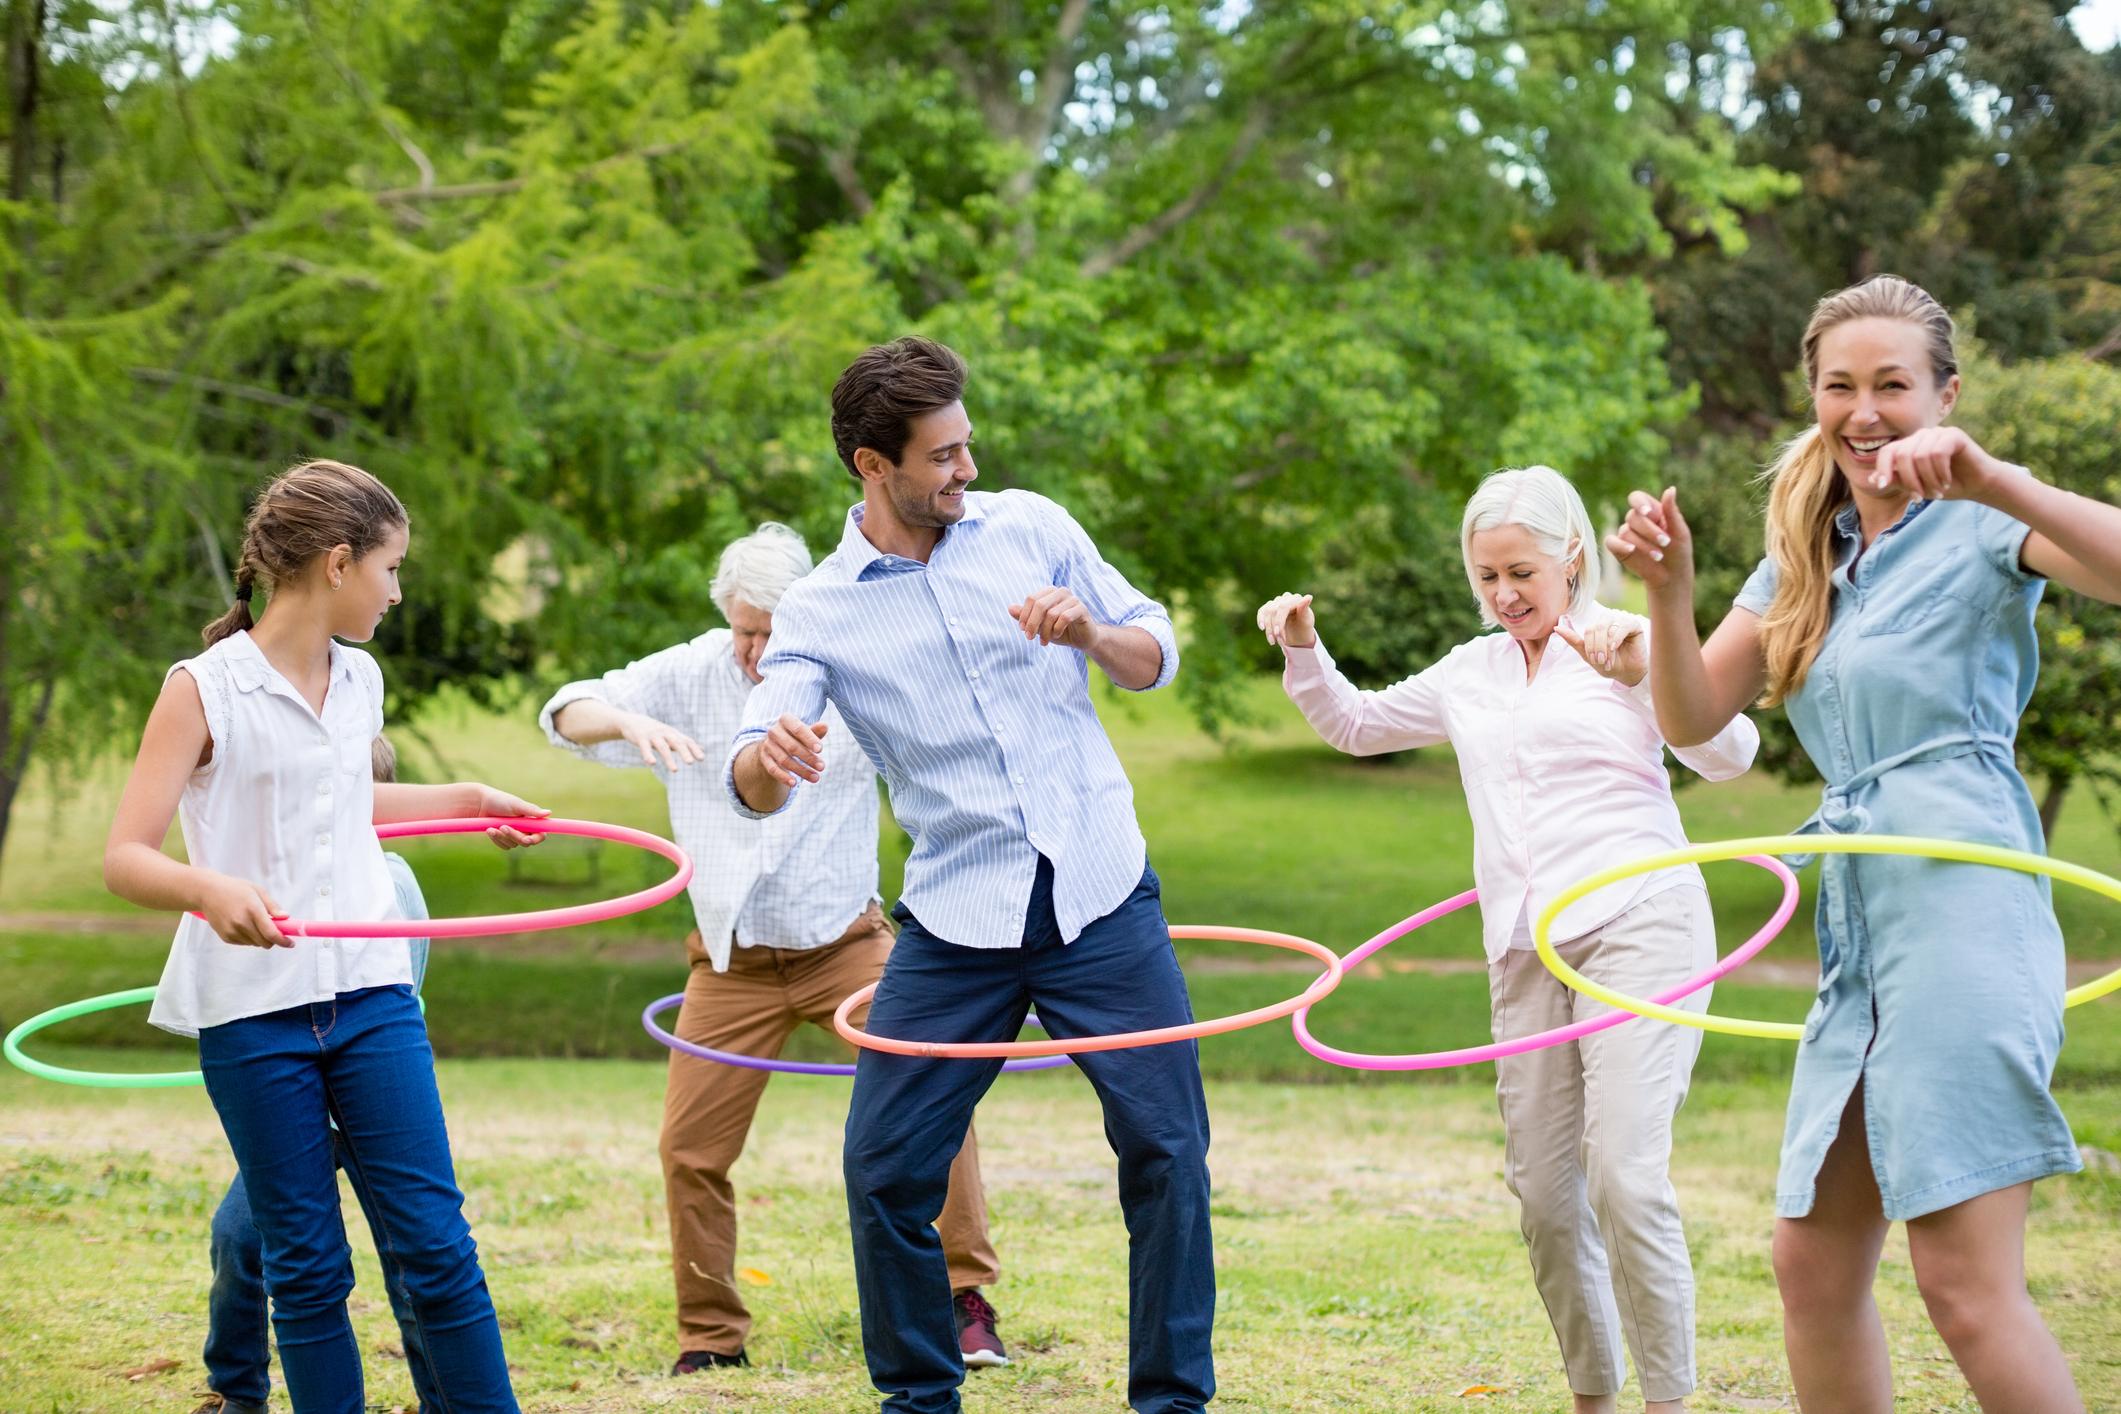 Multi-generation-family-playing-with-hula-hoop-656349580_2125x1416.jpeg